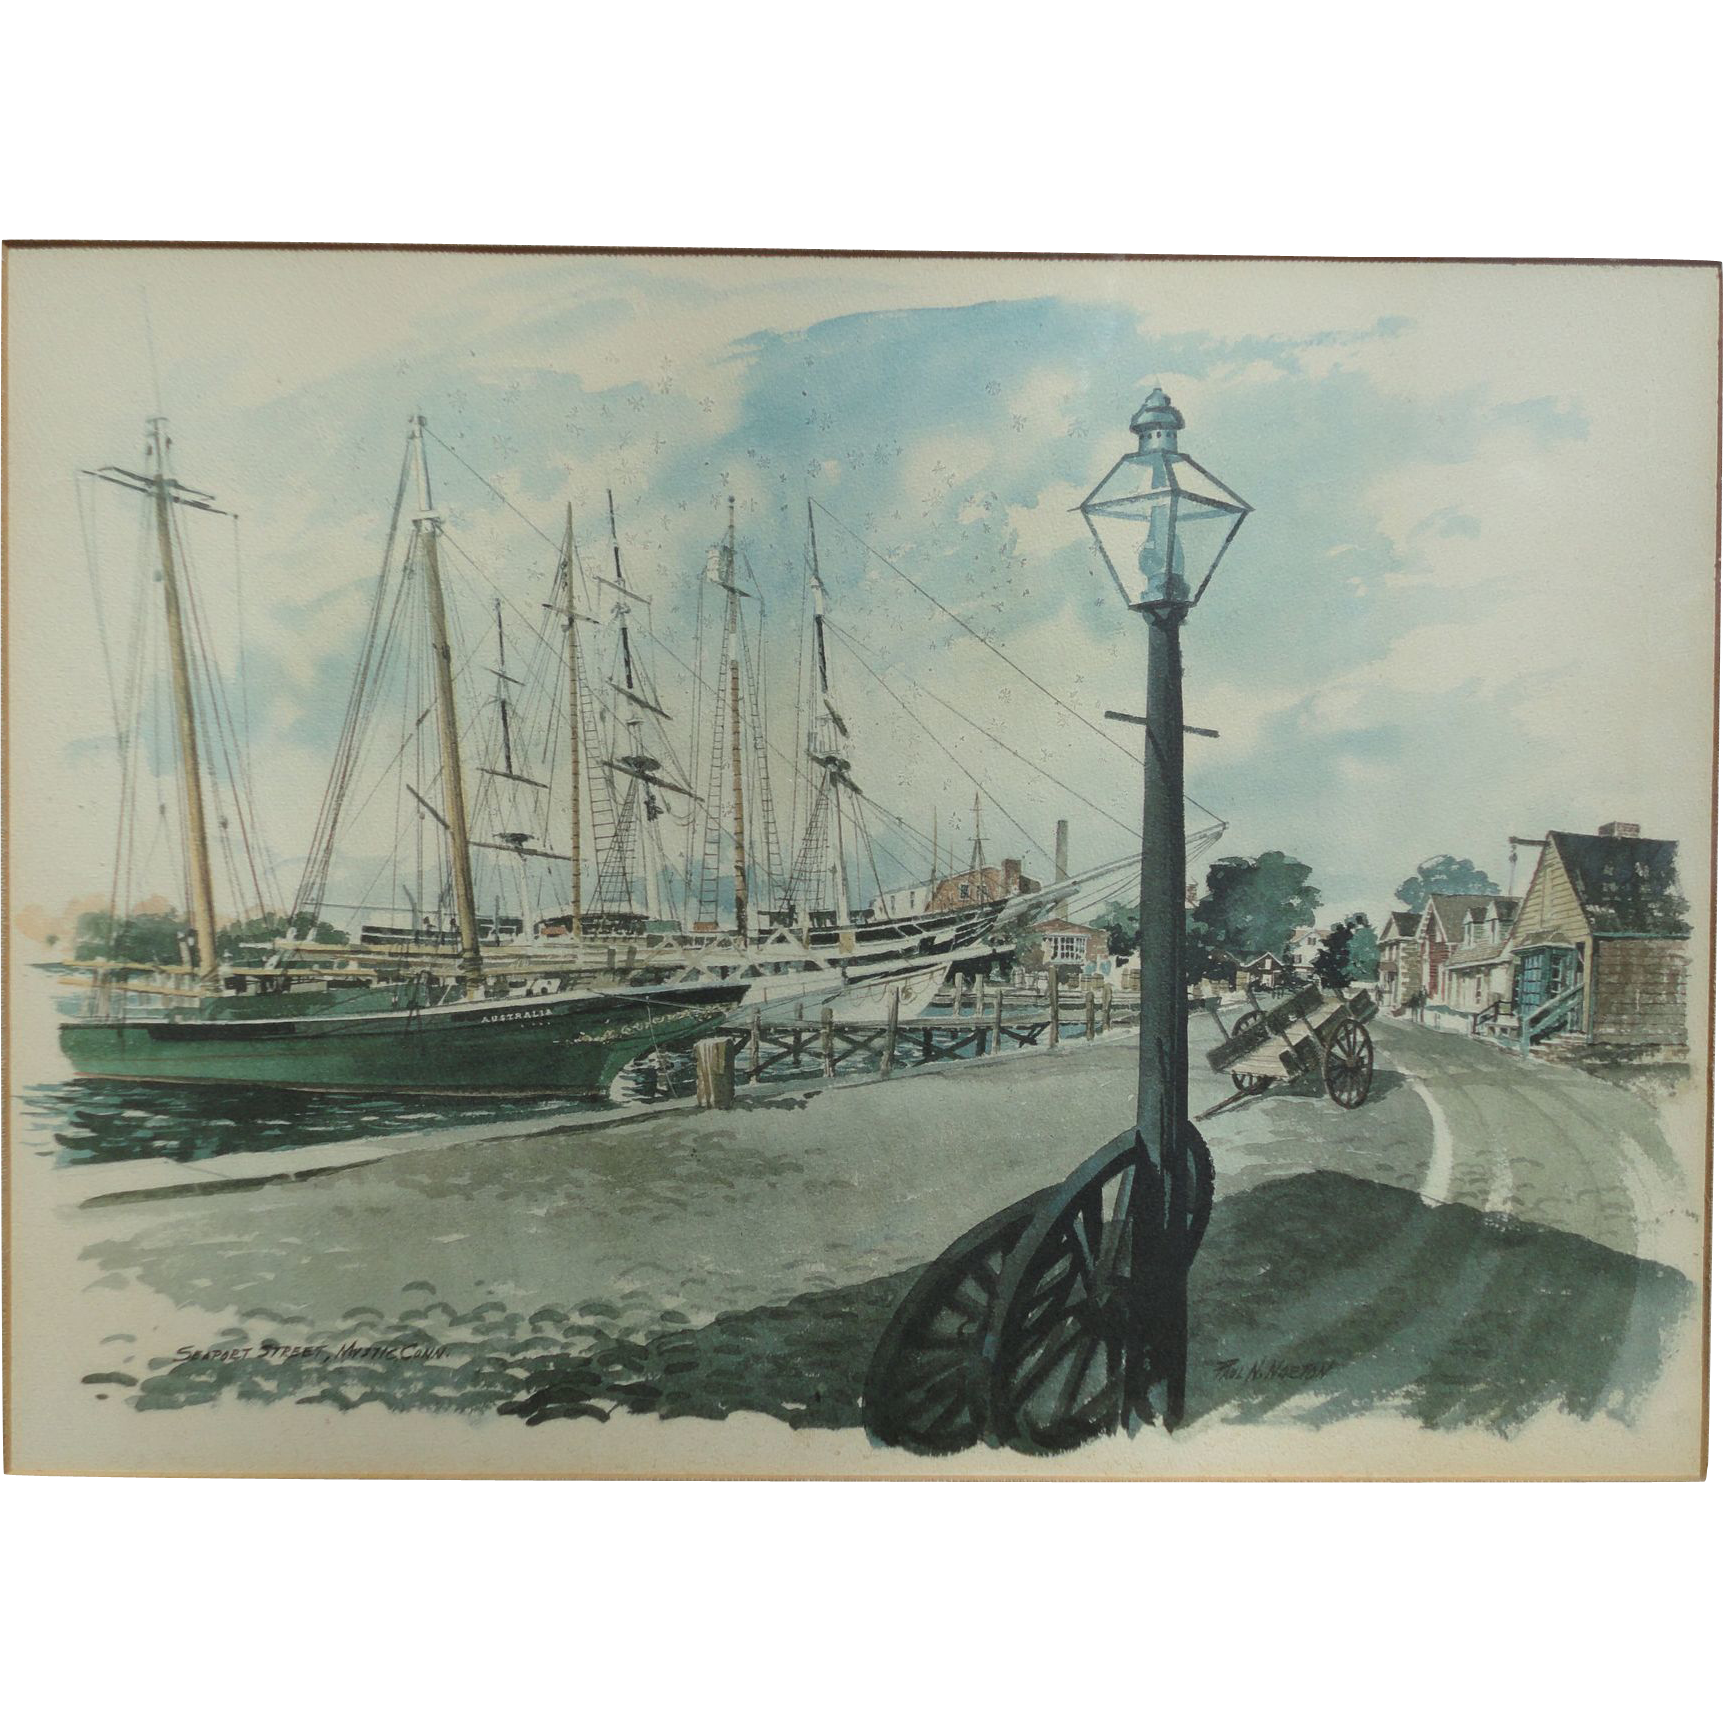 Connecticut watercolor artists directory - 1960s Paul N Norton Watercolor Framed Art Print Original Mystic Seaport Connecticut